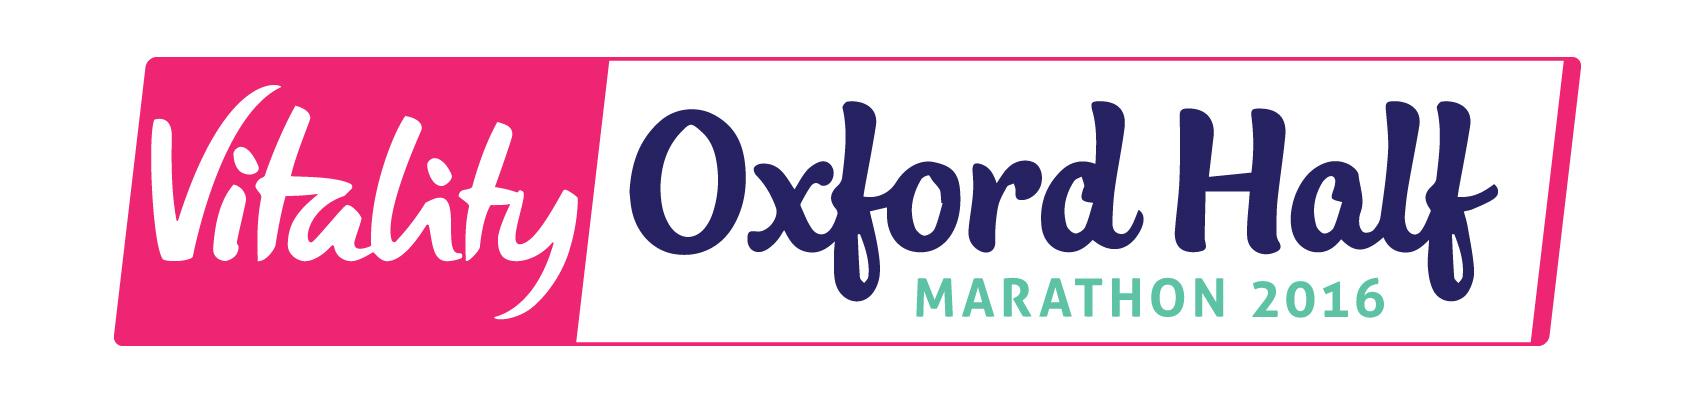 vitality-oxford-half-logo 2016.jpg